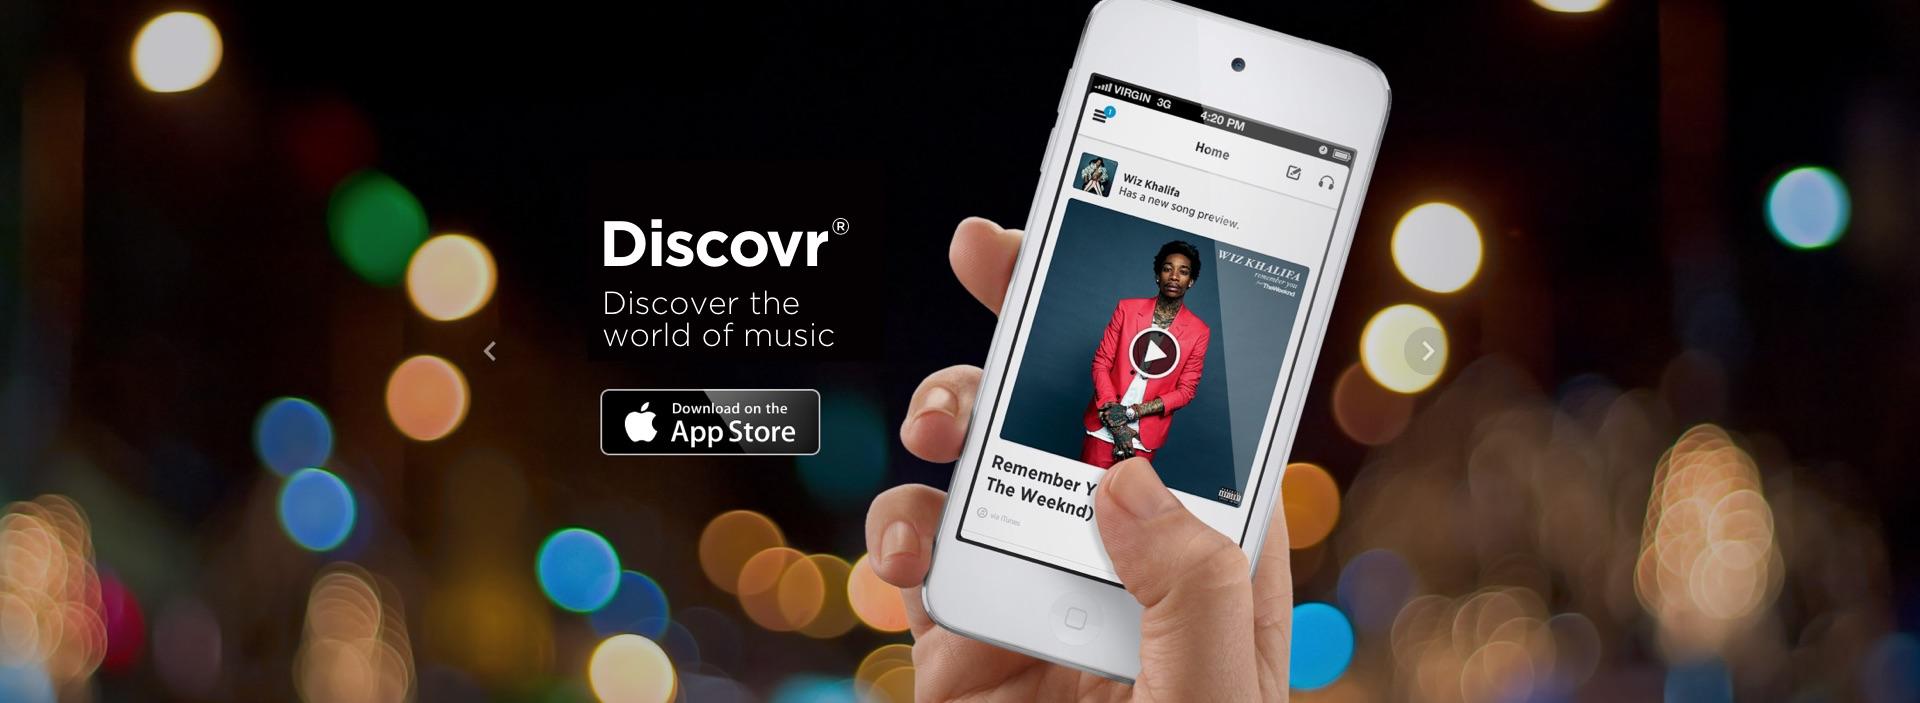 Discovr-WebBannerBokeh.jpg